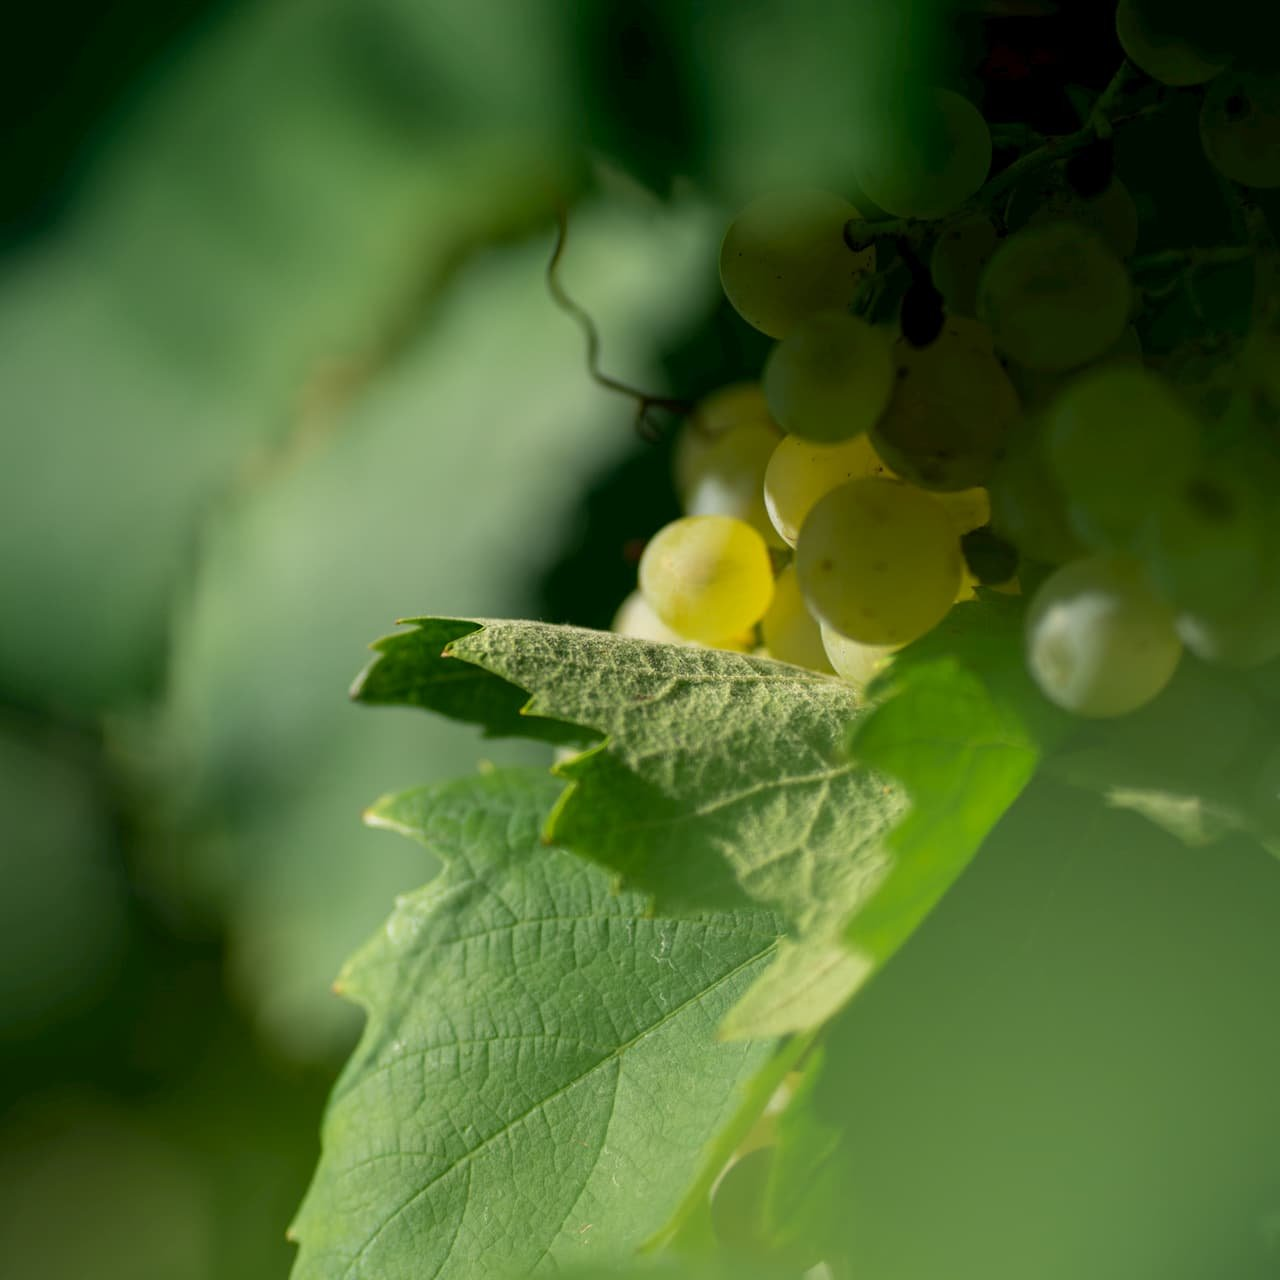 CANTINE RIONDO uva